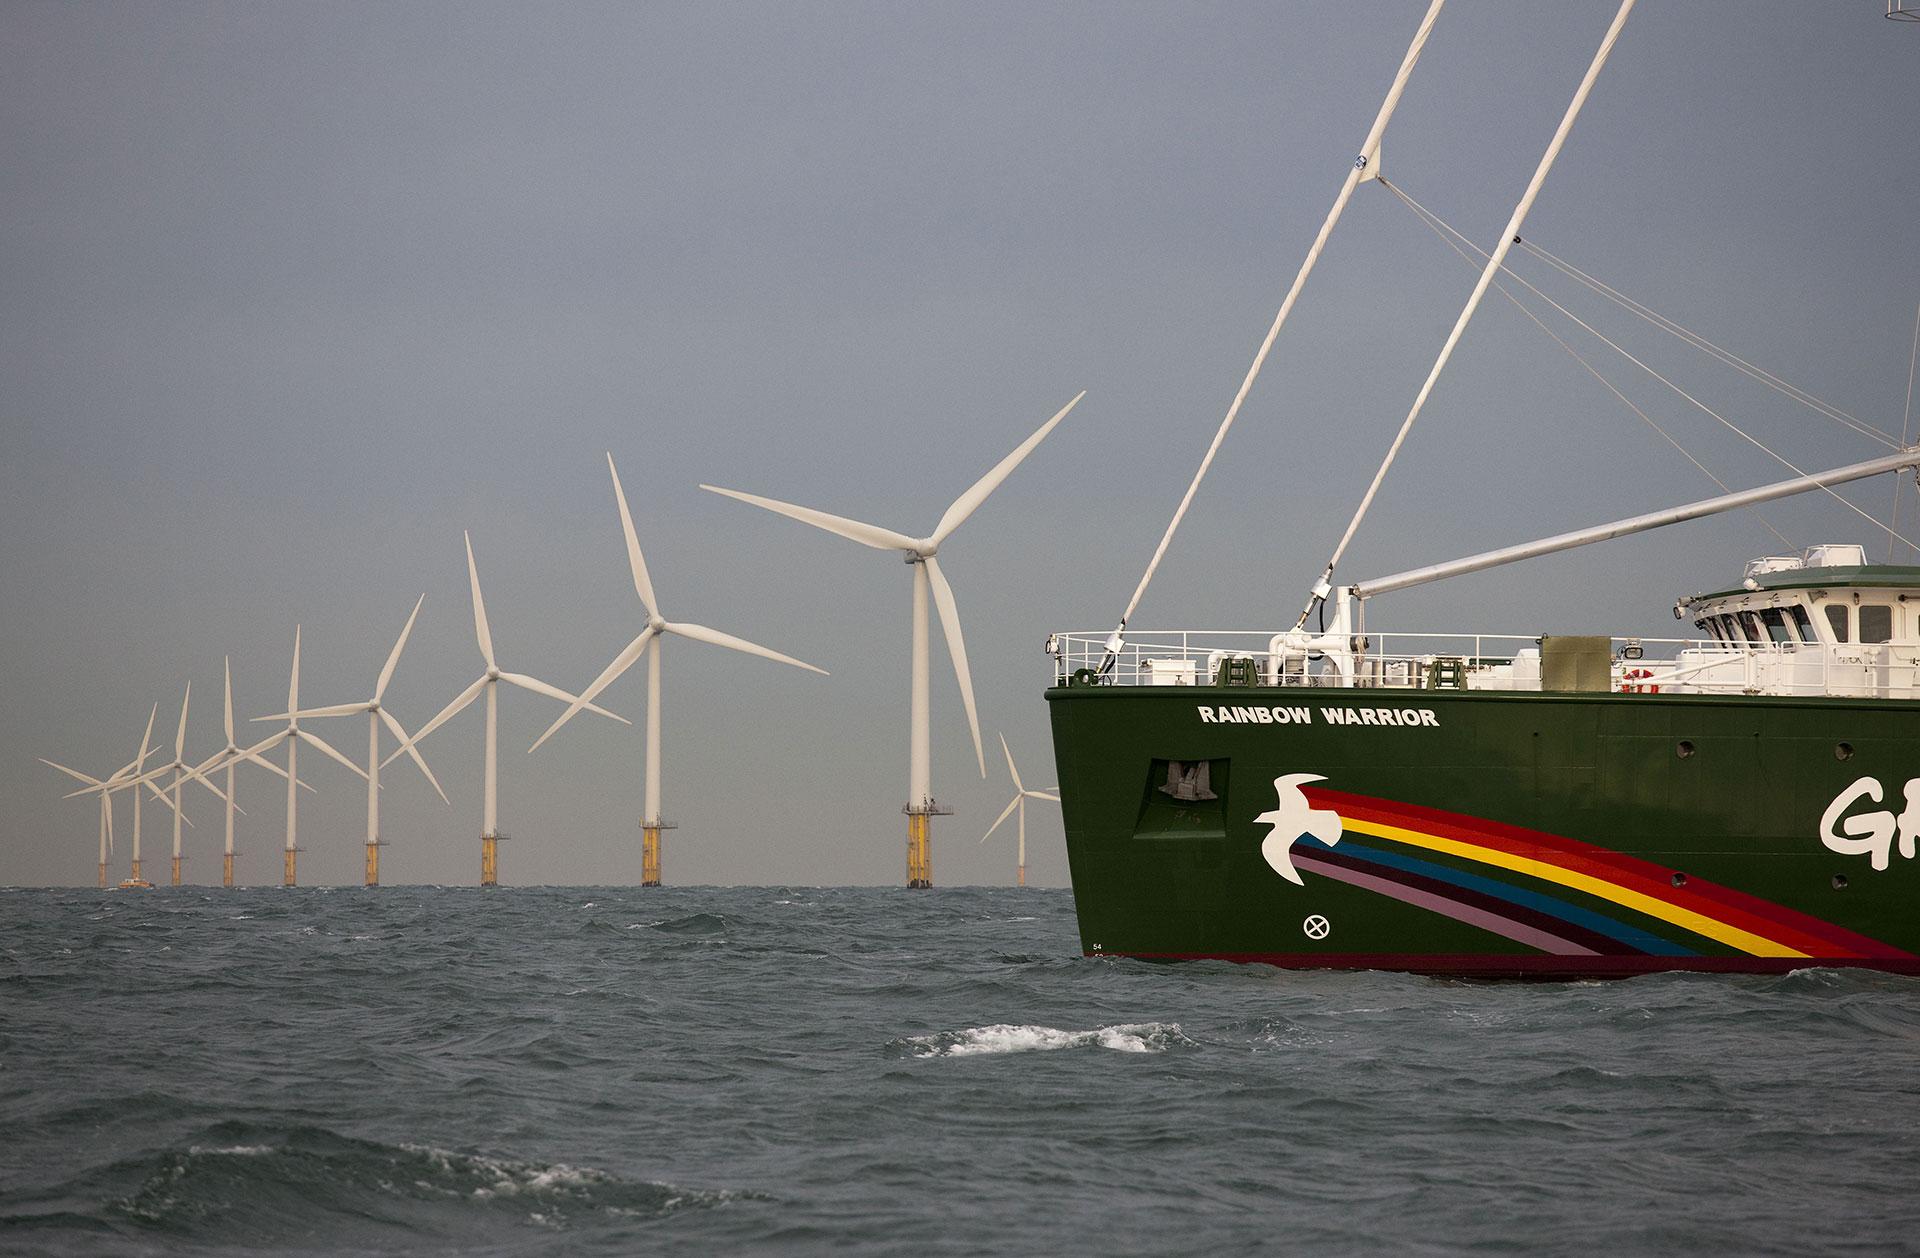 Rainbow Warrior Passes Amalia Wind Farm © Bas Beentjes / Greenpeace